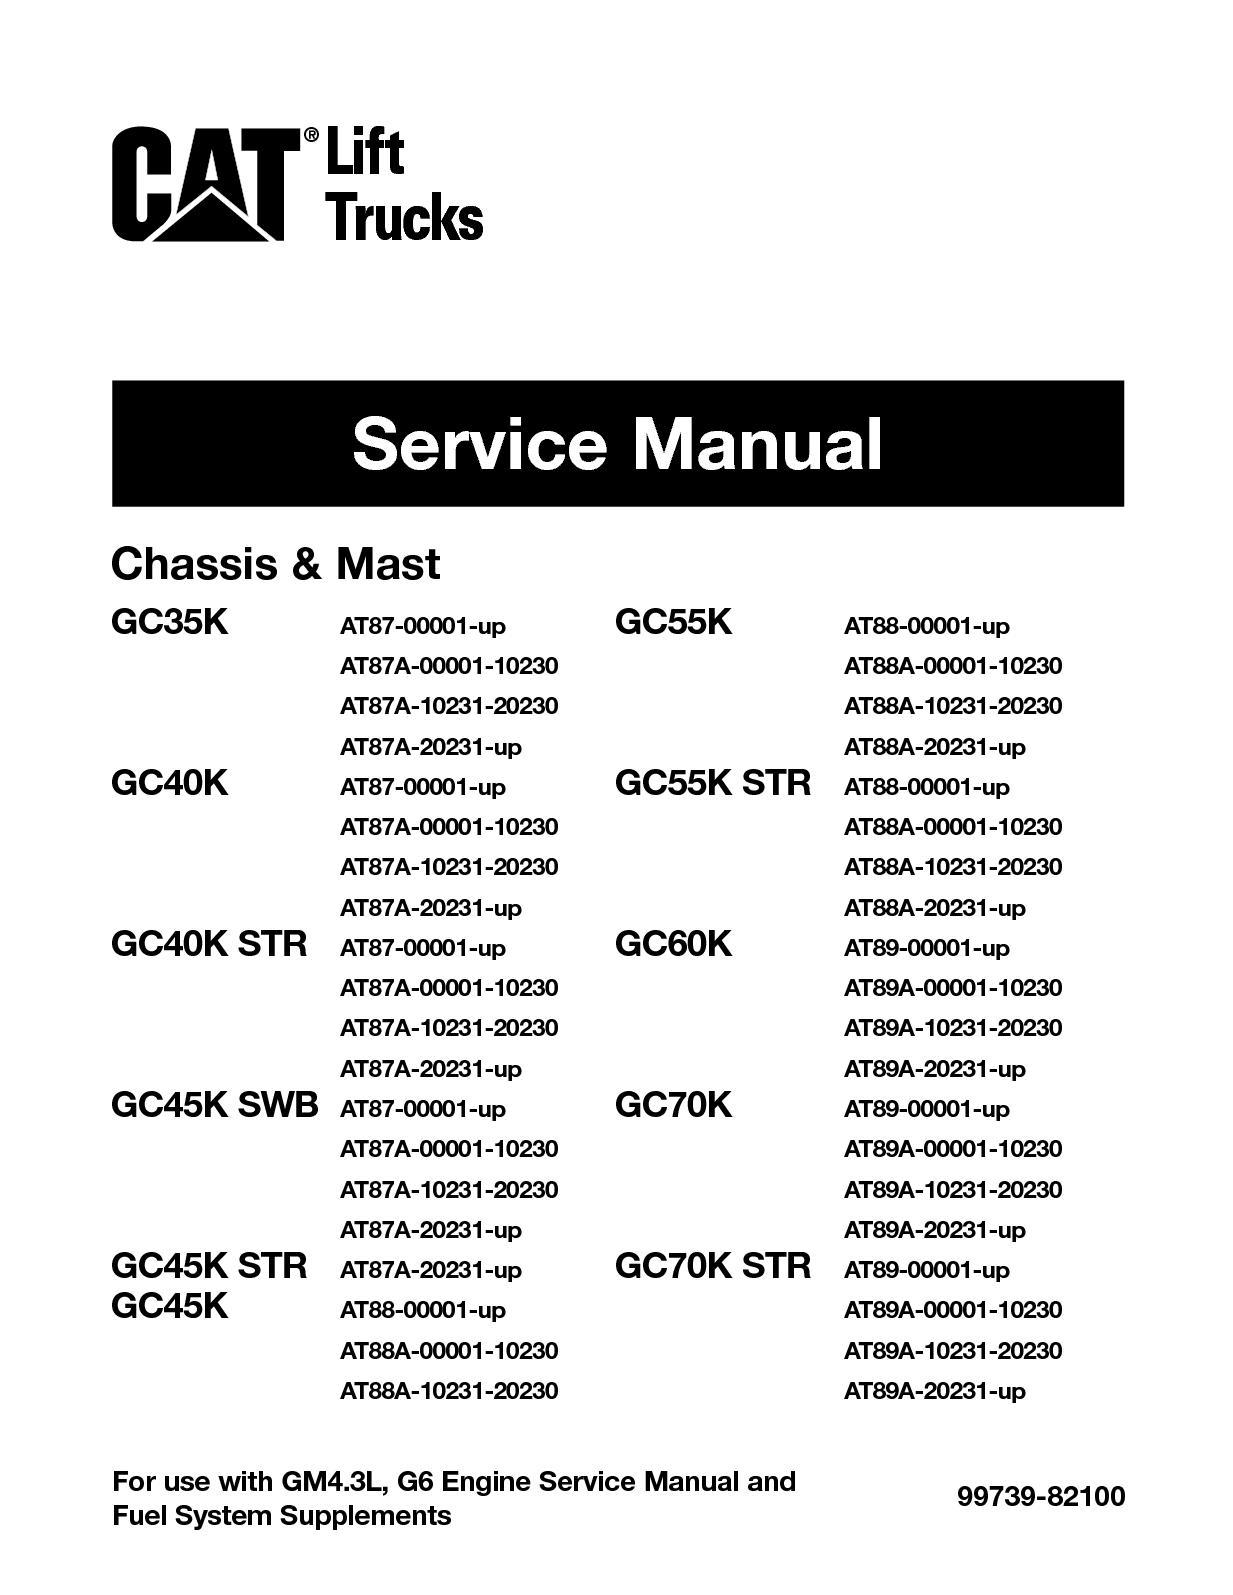 Calamo Caterpillar Cat Gc45k Swb Forklift Lift Trucks Service Hydraulic Control Valve Diagram Mast Repair Manual Snat87a 00001 10230